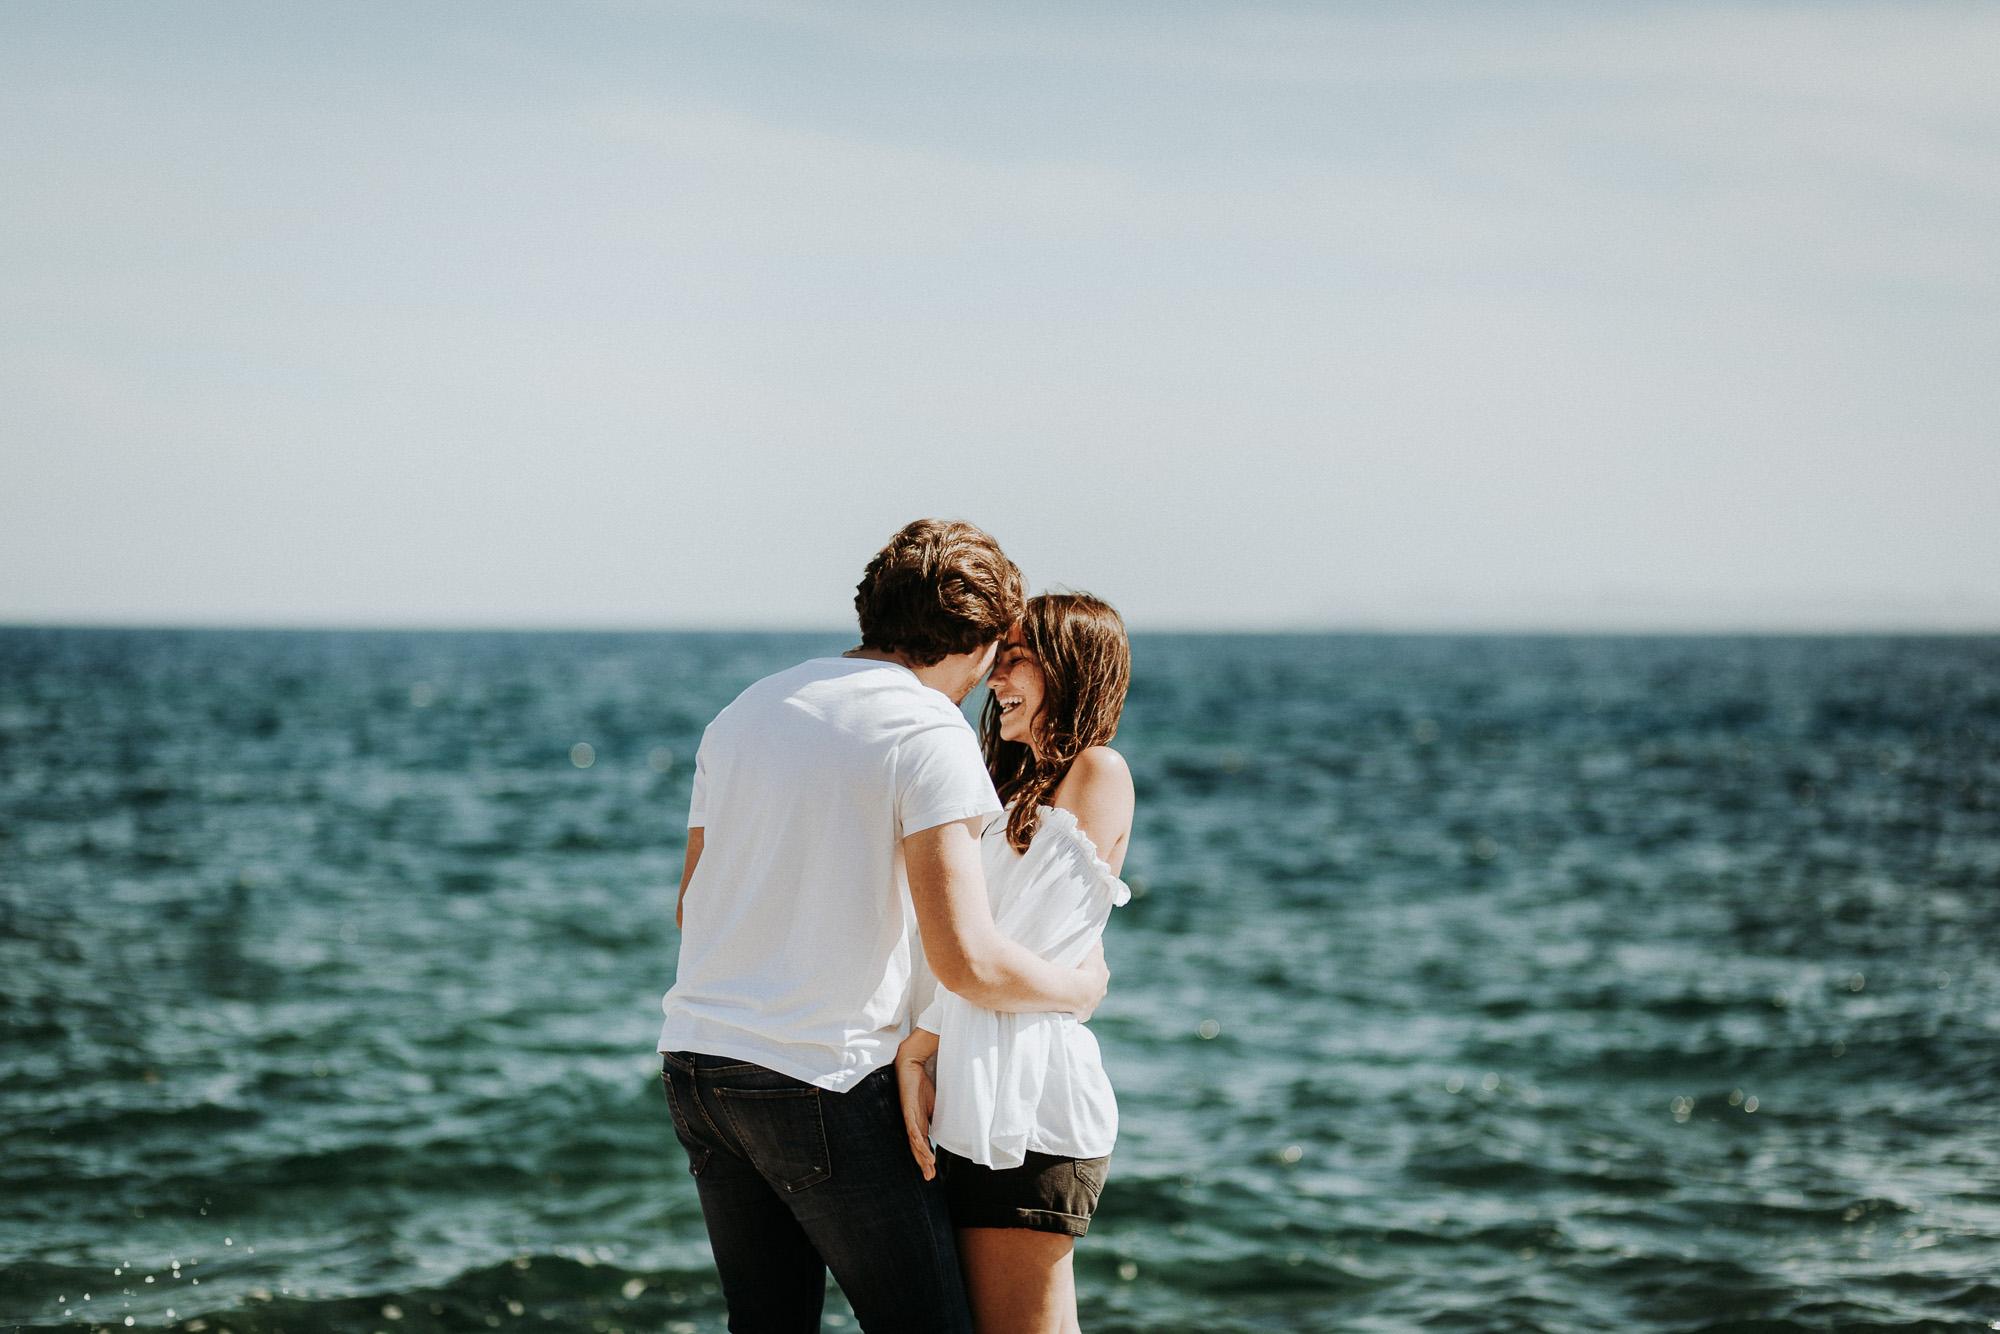 DanielaMarquardtPhotography_wedding_elopement_mallorca_spain_stjordi_sessalines_marinaandxavi177